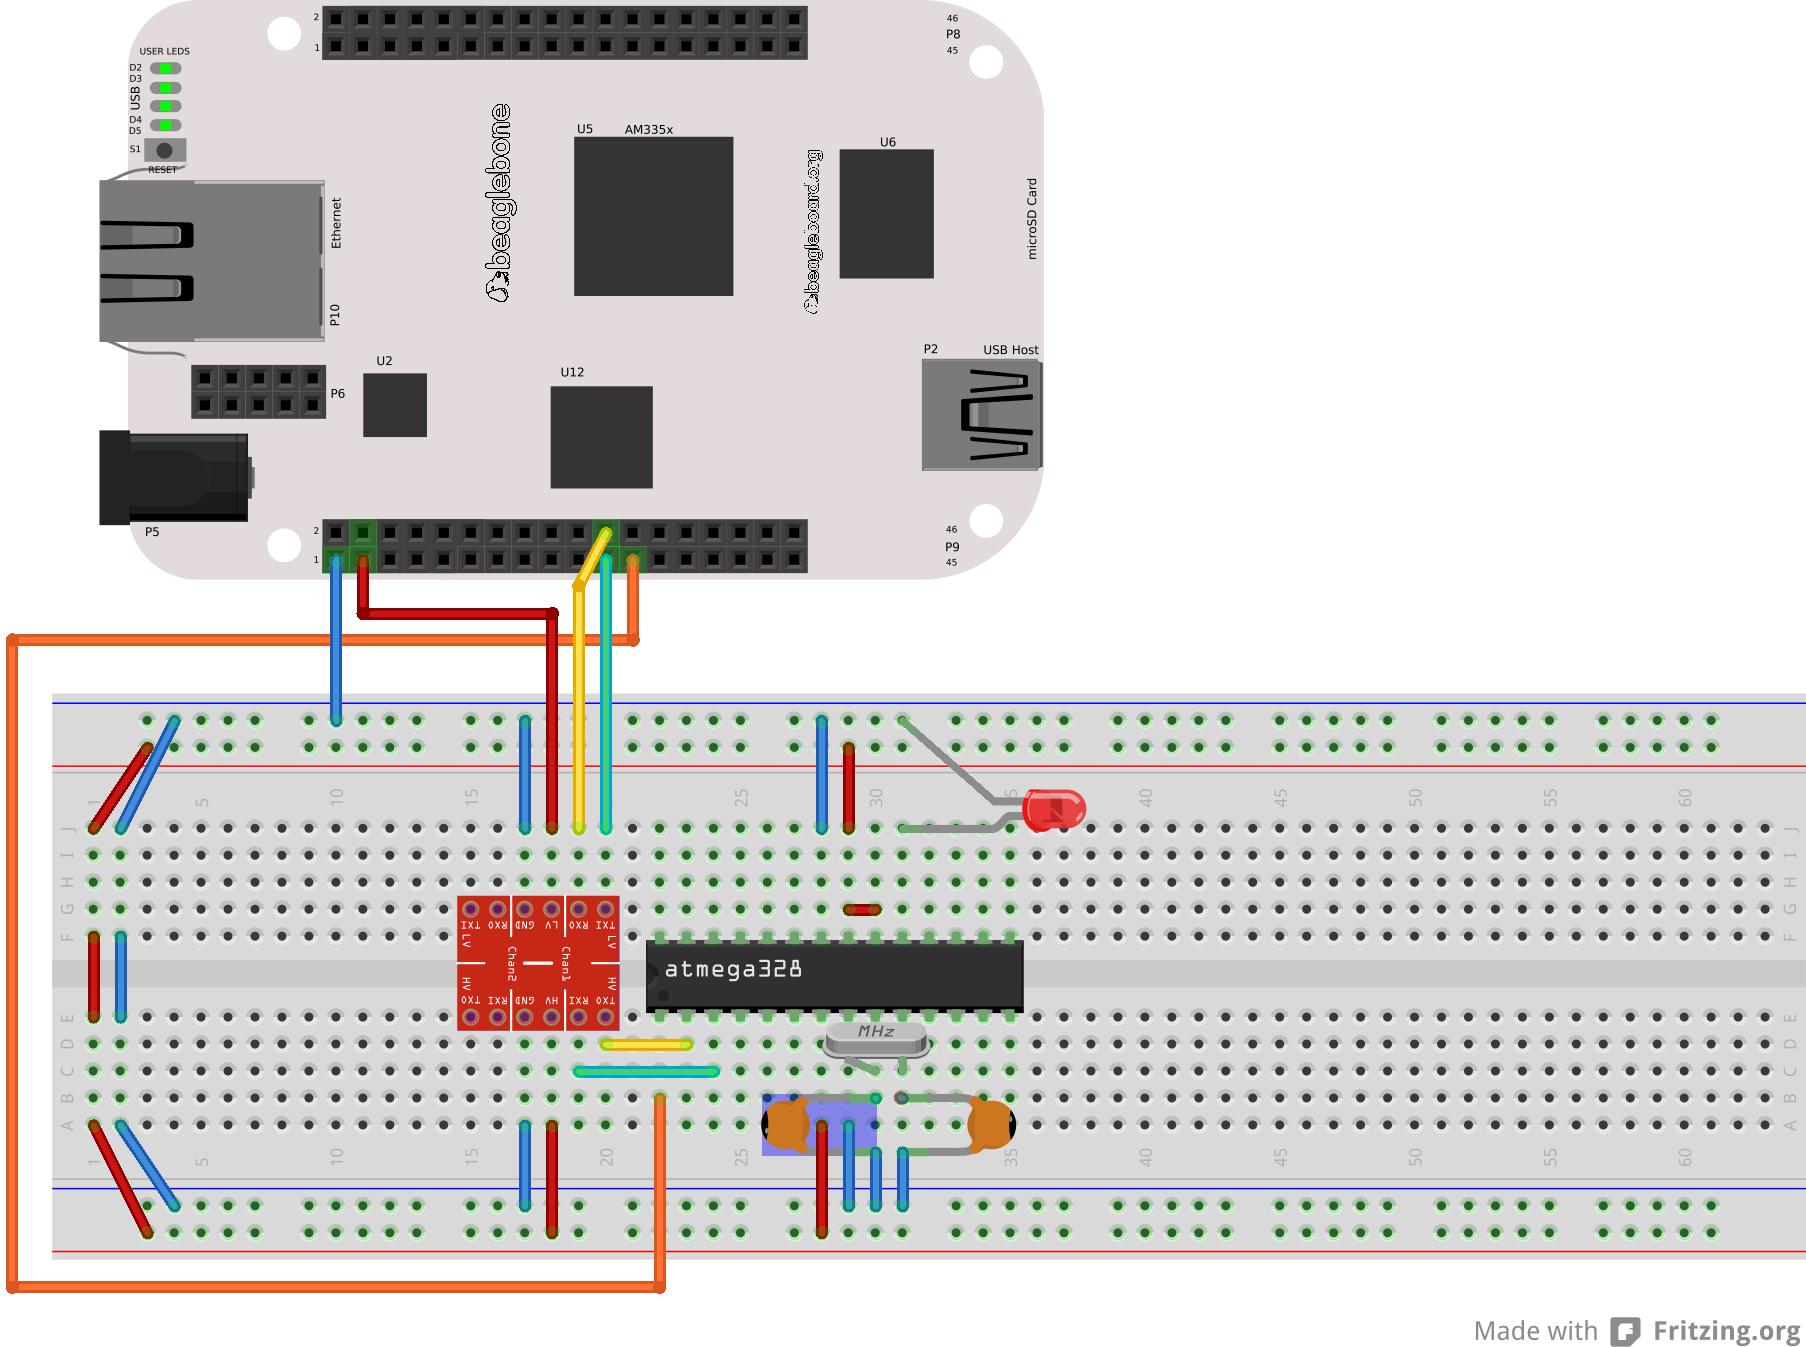 Program an Arduino using BeagleBone, without USB